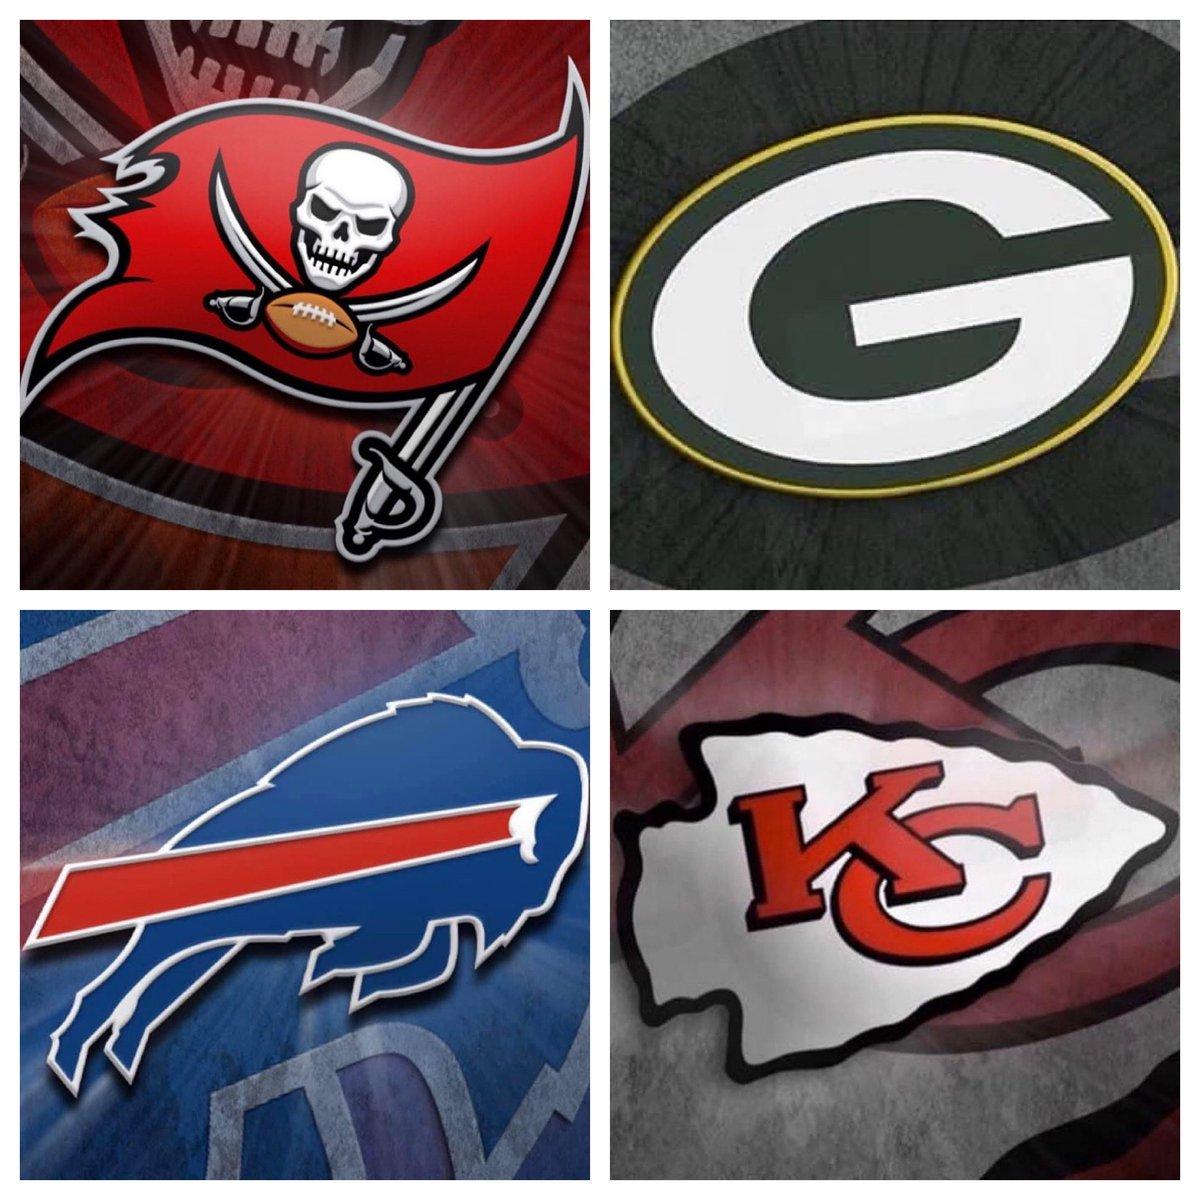 #IESRSN And Then There Were Four. #NFL #NFLPlayoffs #ChampionshipWeekend #NFCConferenceChampionship #TBvsNO #GoBucs #Saints #AFCConferenceChampionship #BUFvsKC #BillsMafia #ChiefsKingdom